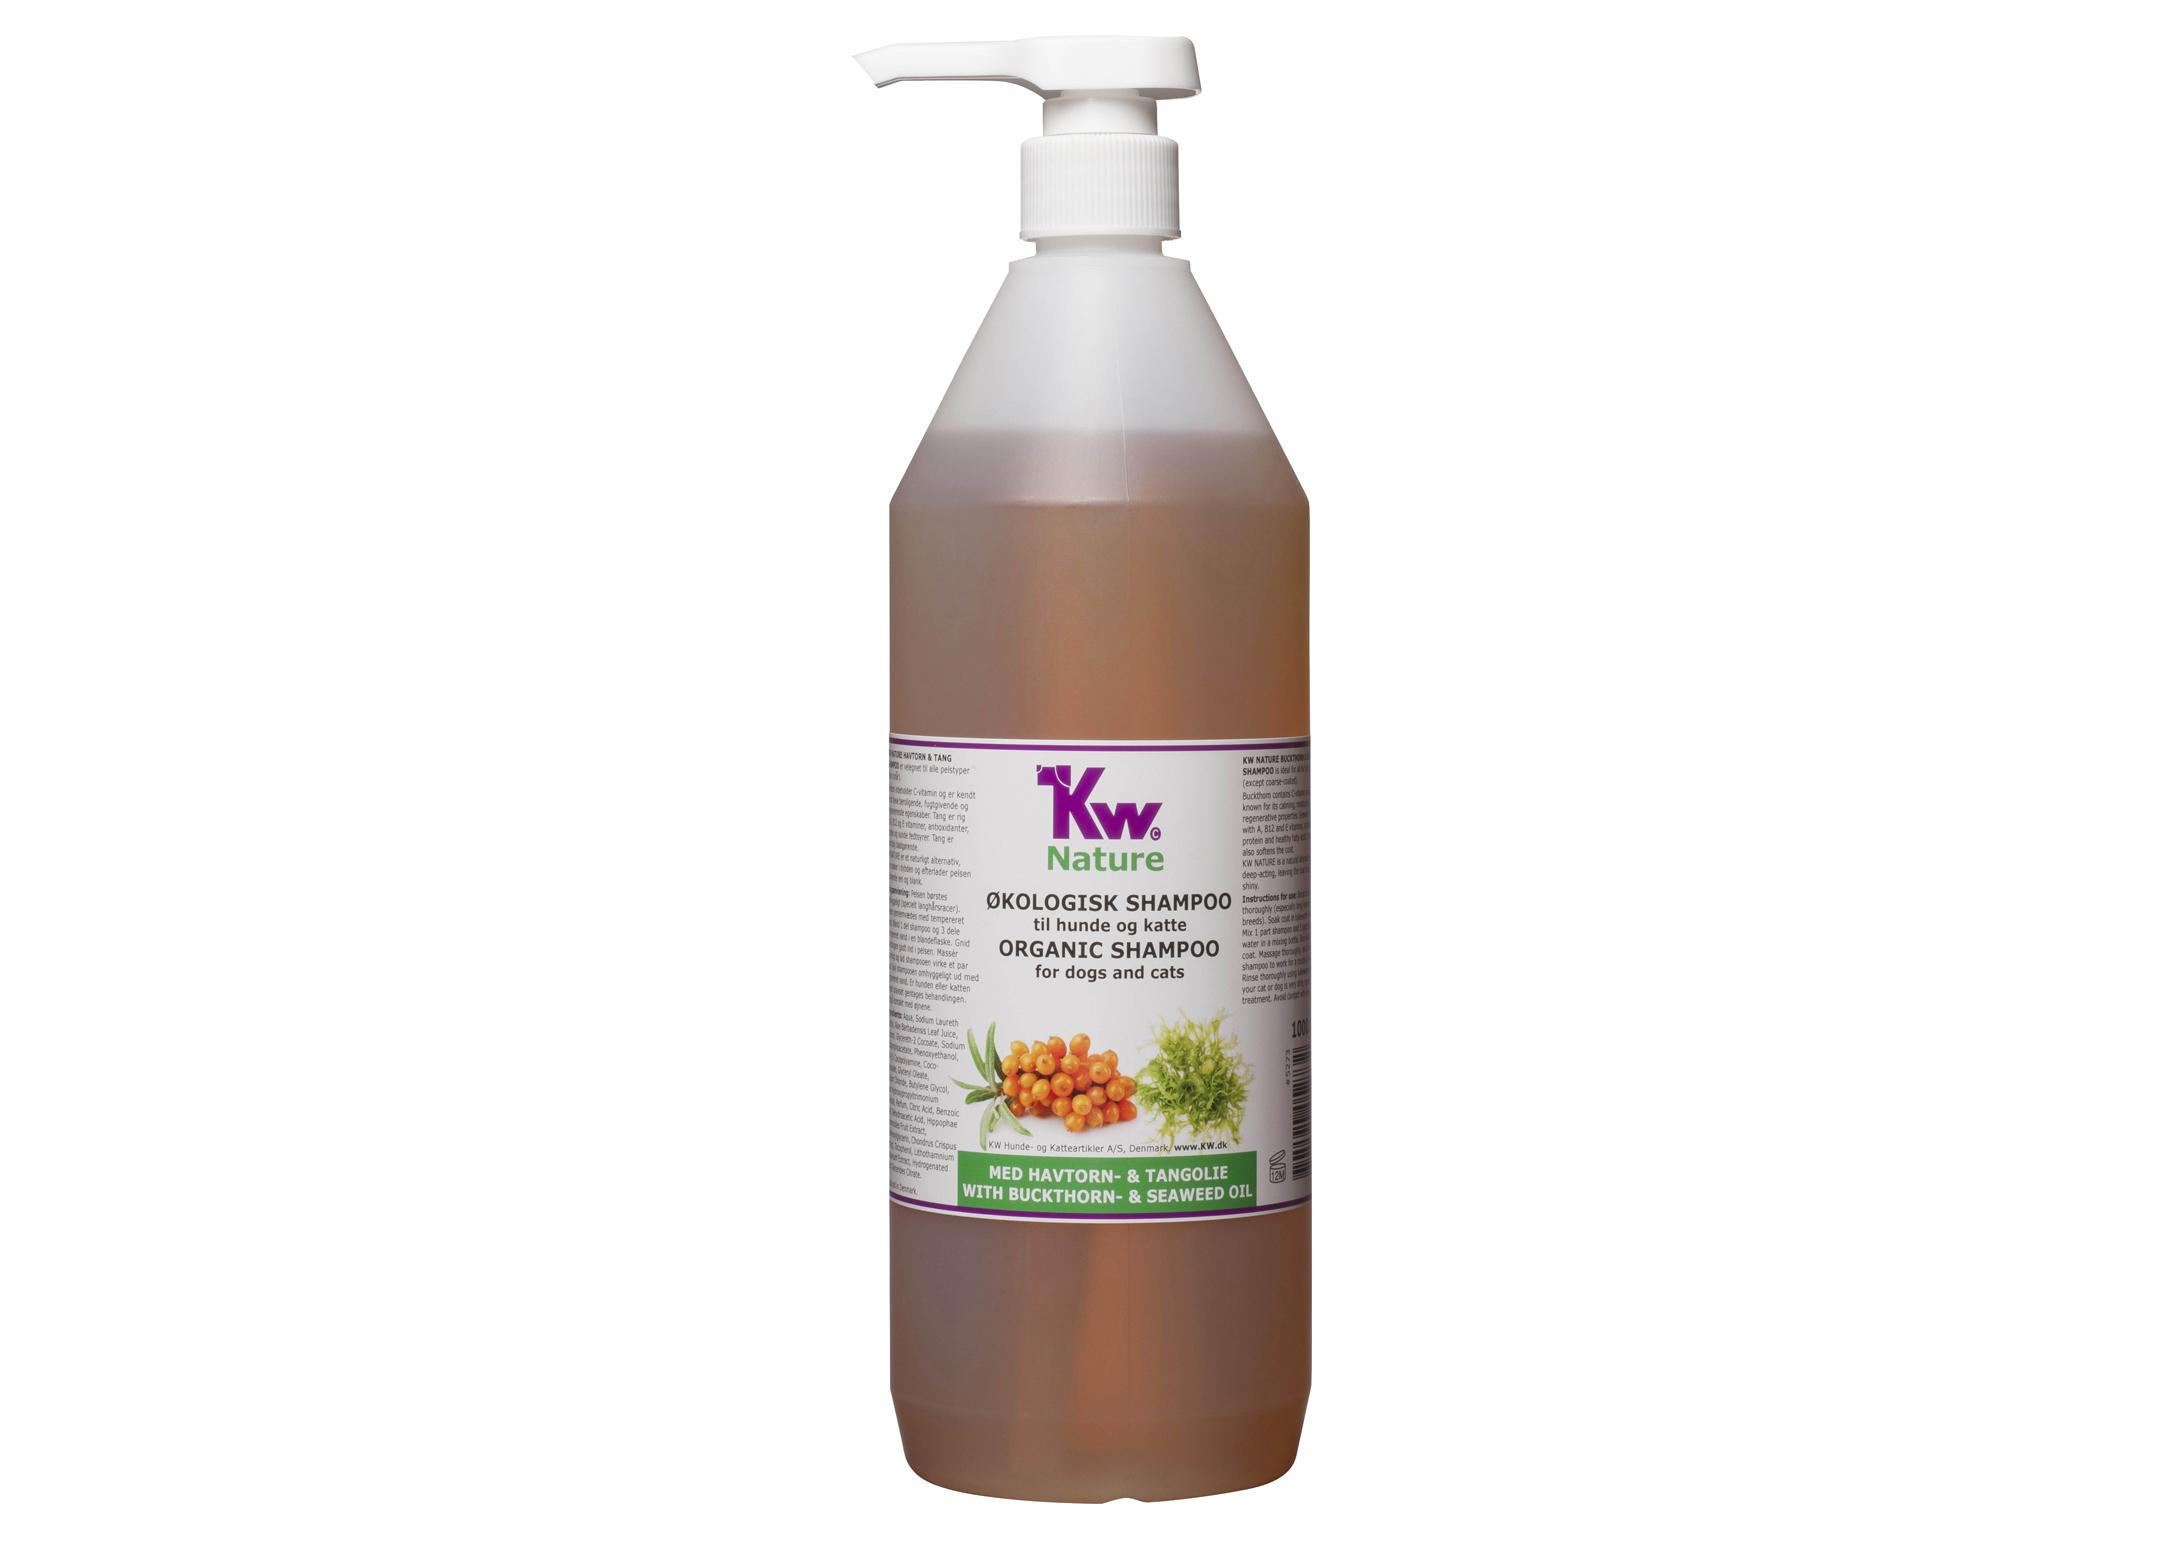 KW Nature Buckthorn & Seaweed Oil Shampoo 1L